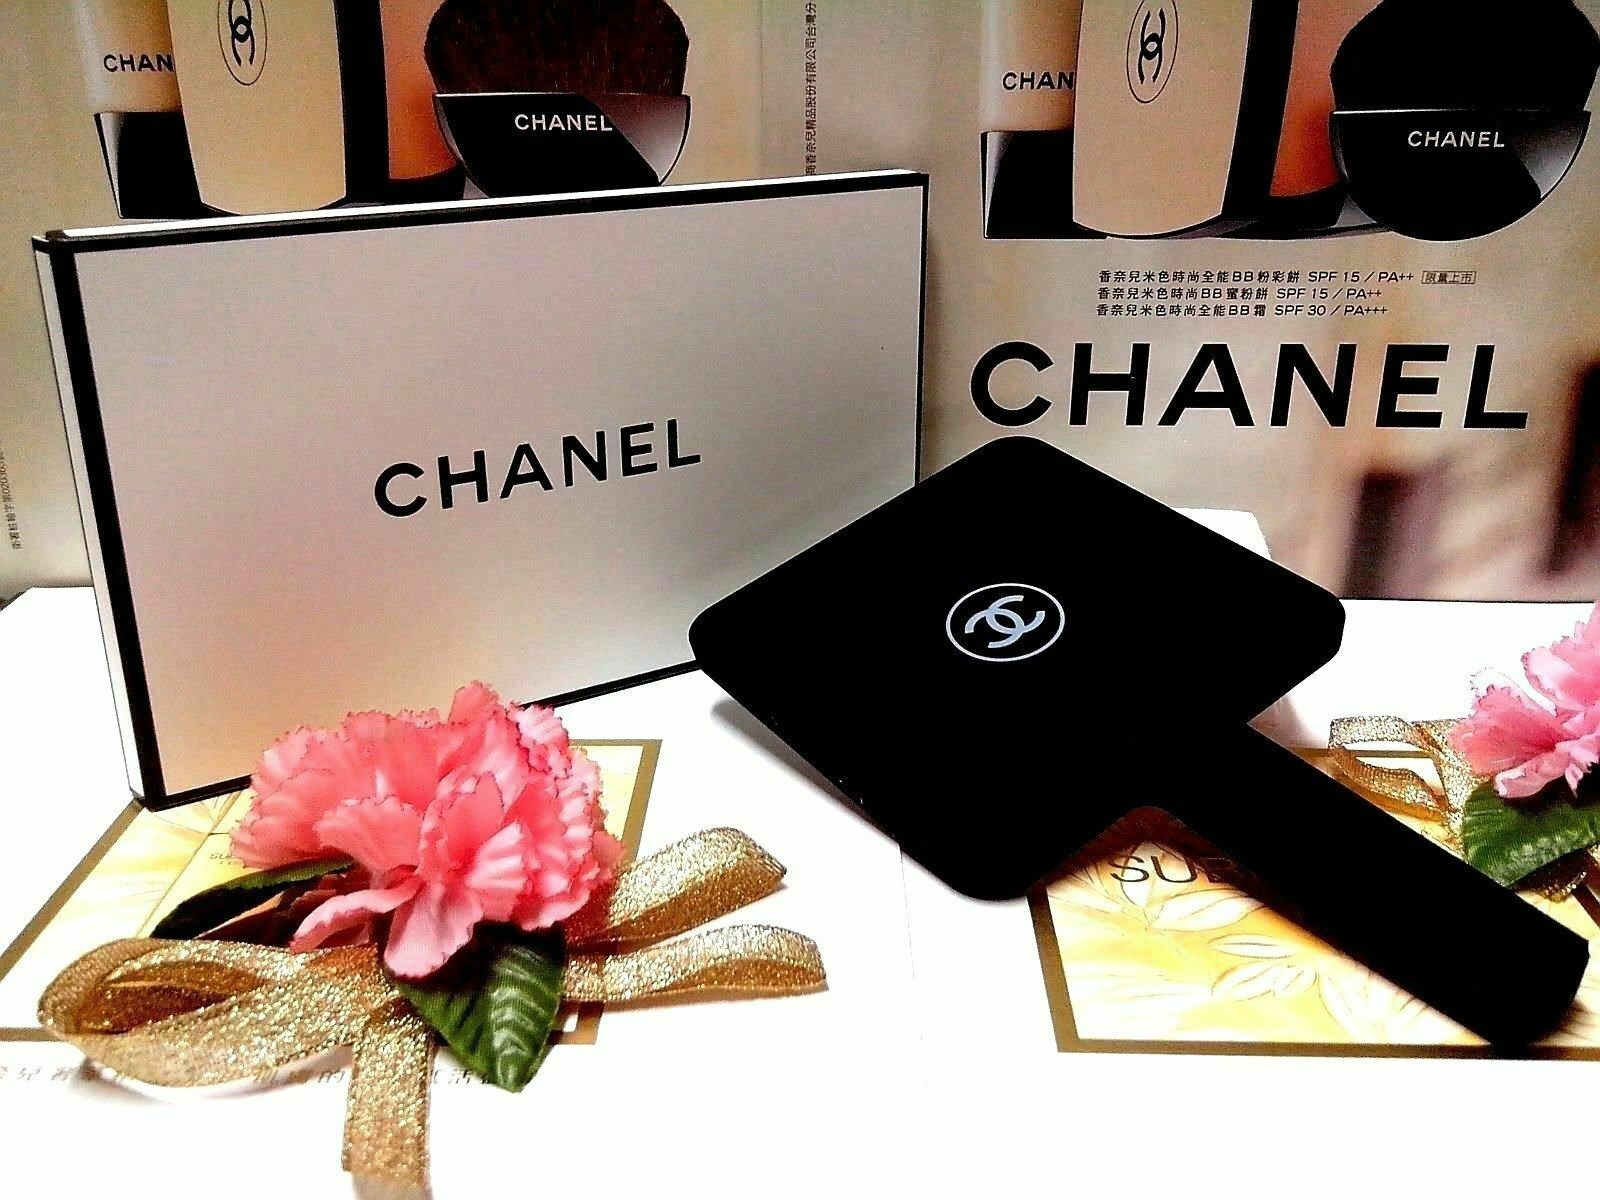 "Chanel Beauty Mirror Black Matte Finish "" Large Size 22 x 12 cm "" GWP BOXED"